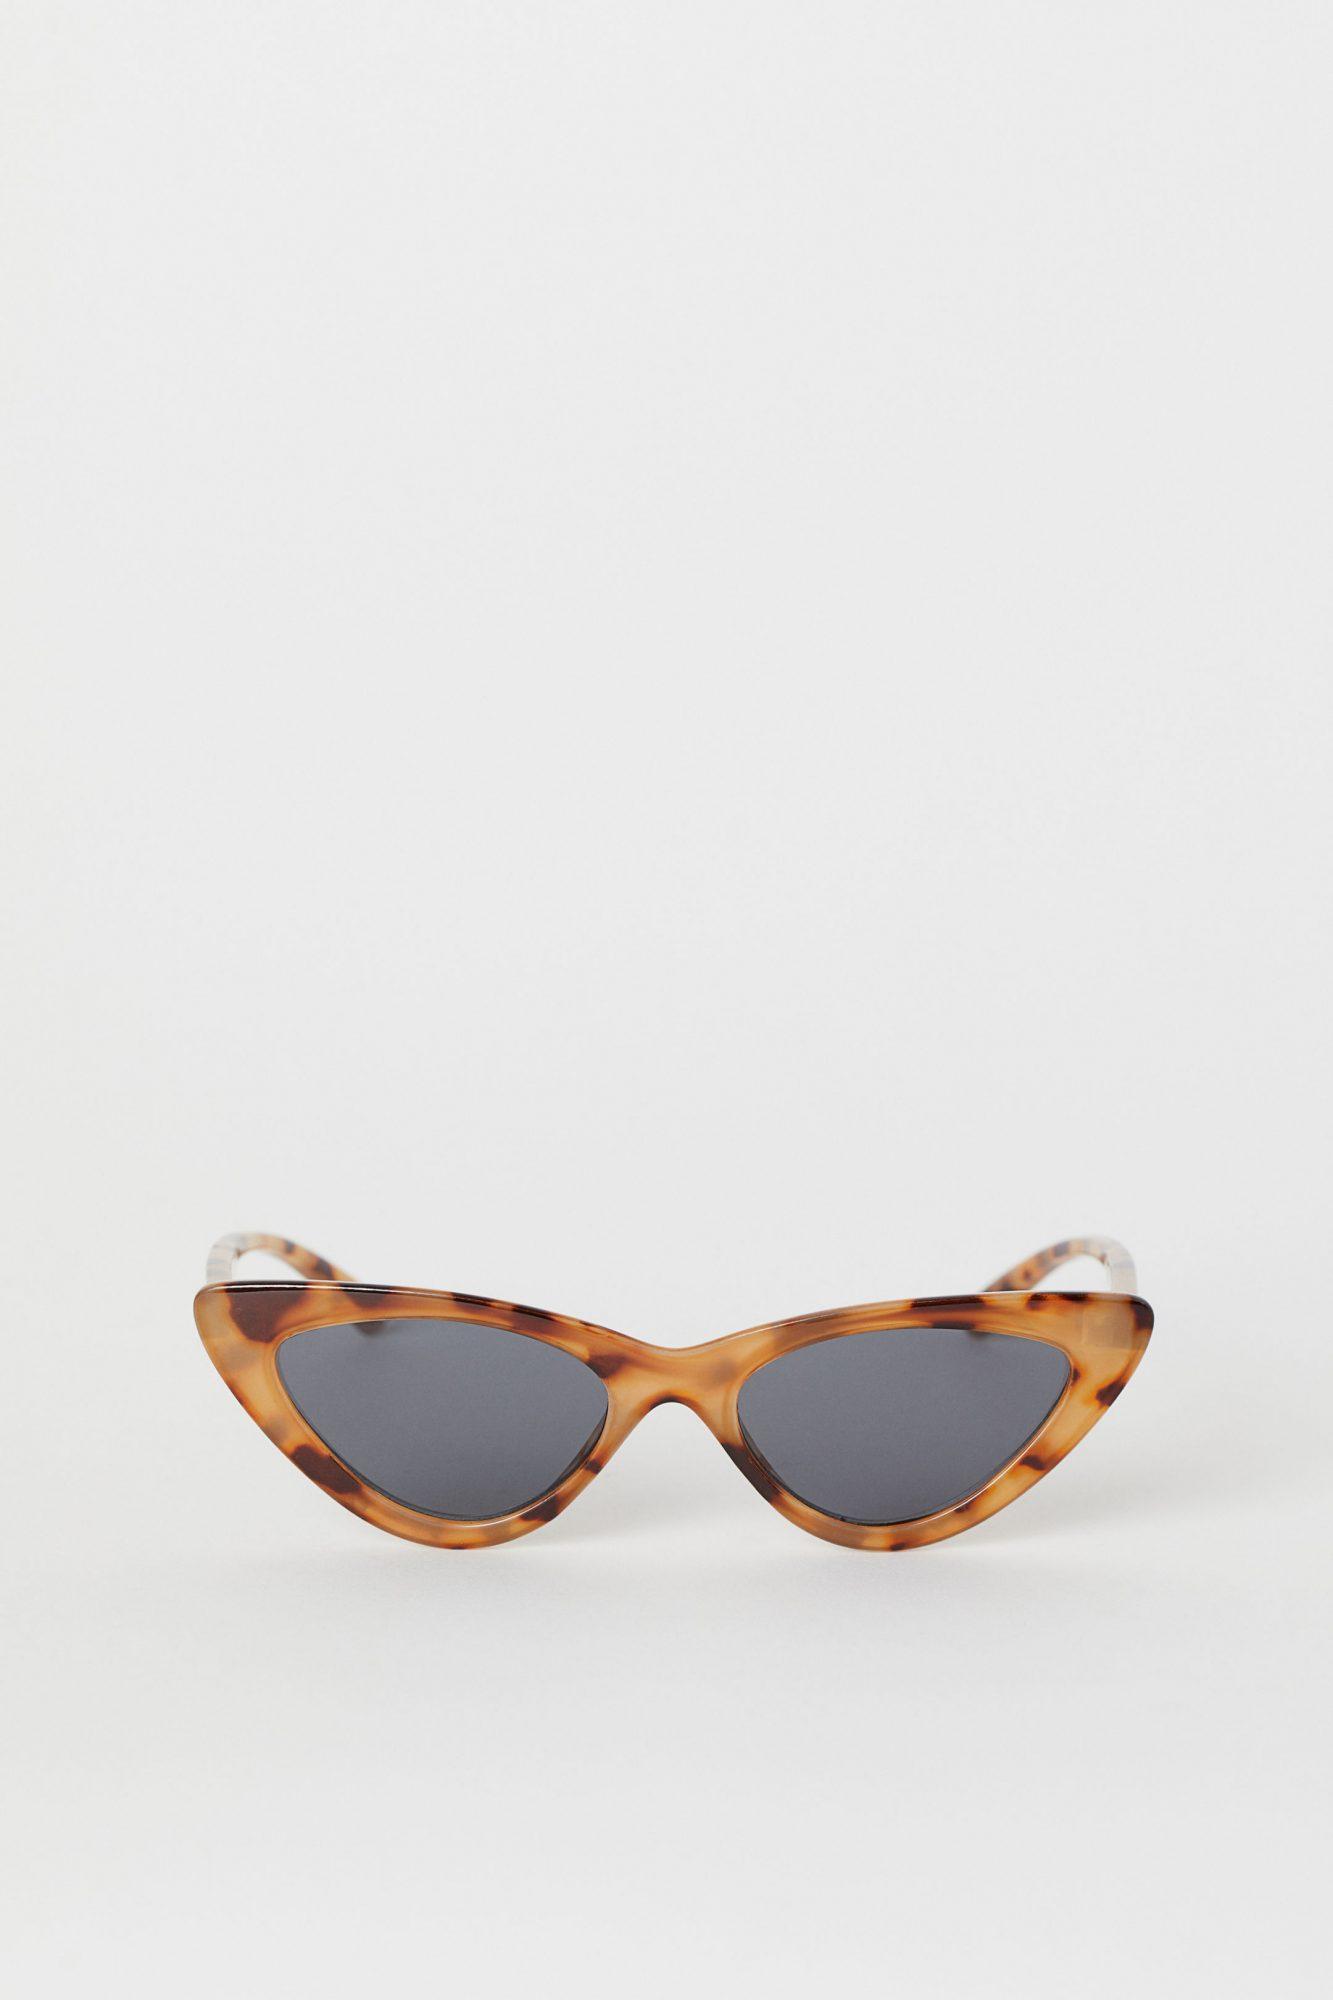 H&M cat-eye sunglasses